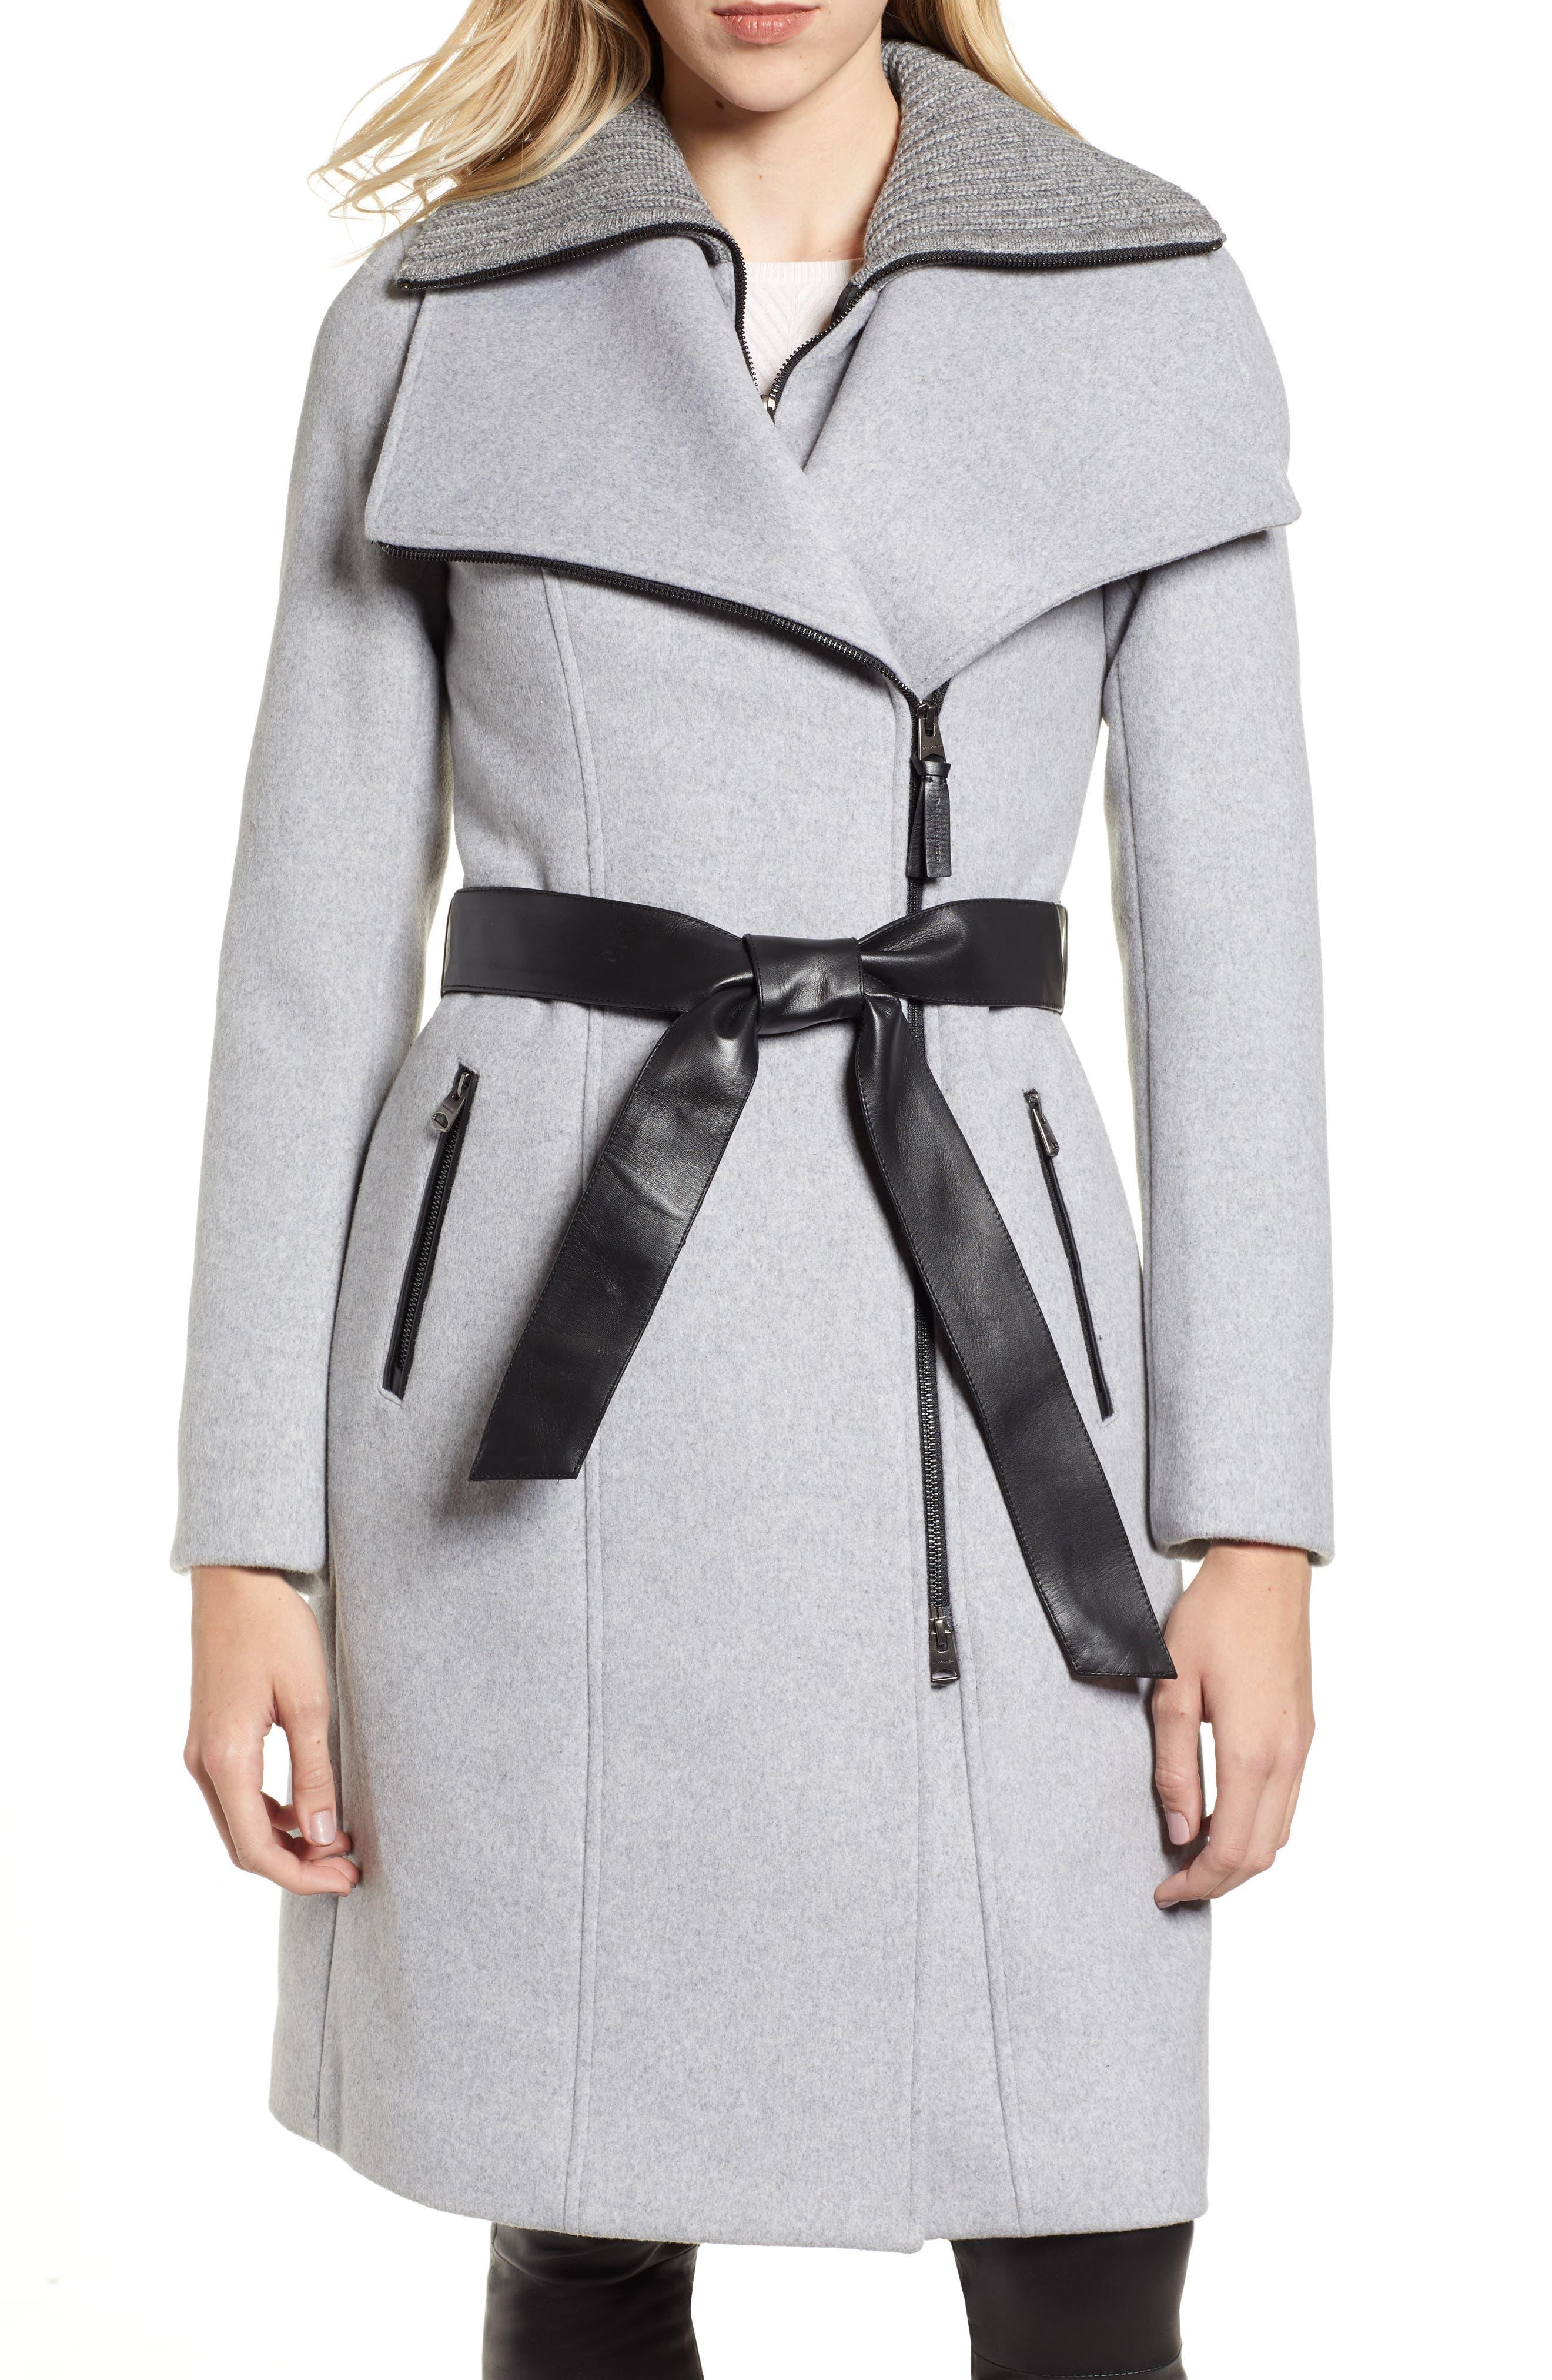 MACKAGE Nori Belted Wool Blend Coat, Main, color, LIGHT GREY